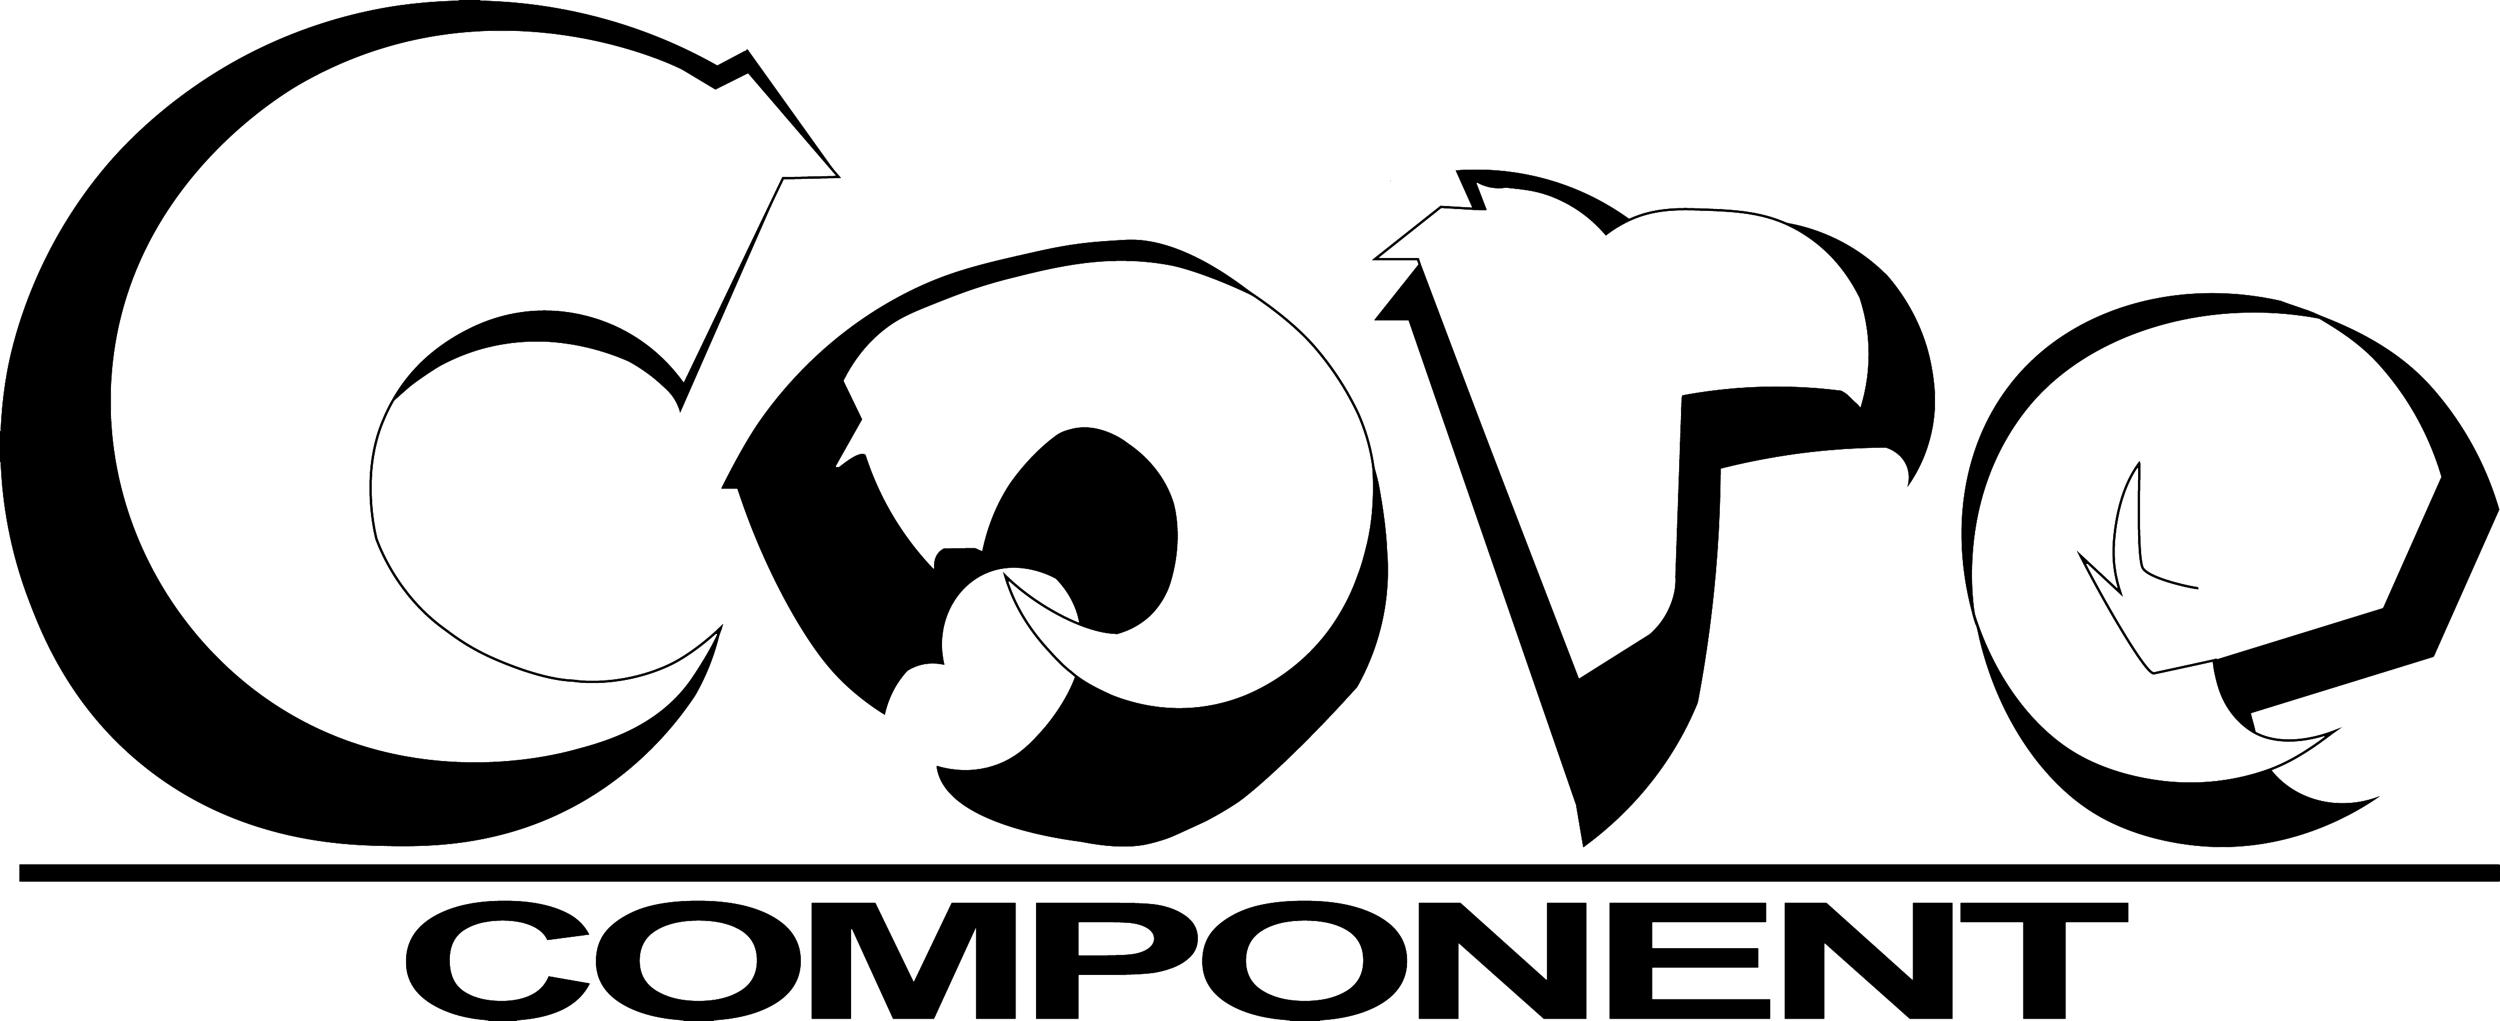 Logo05whitenontransparent.png